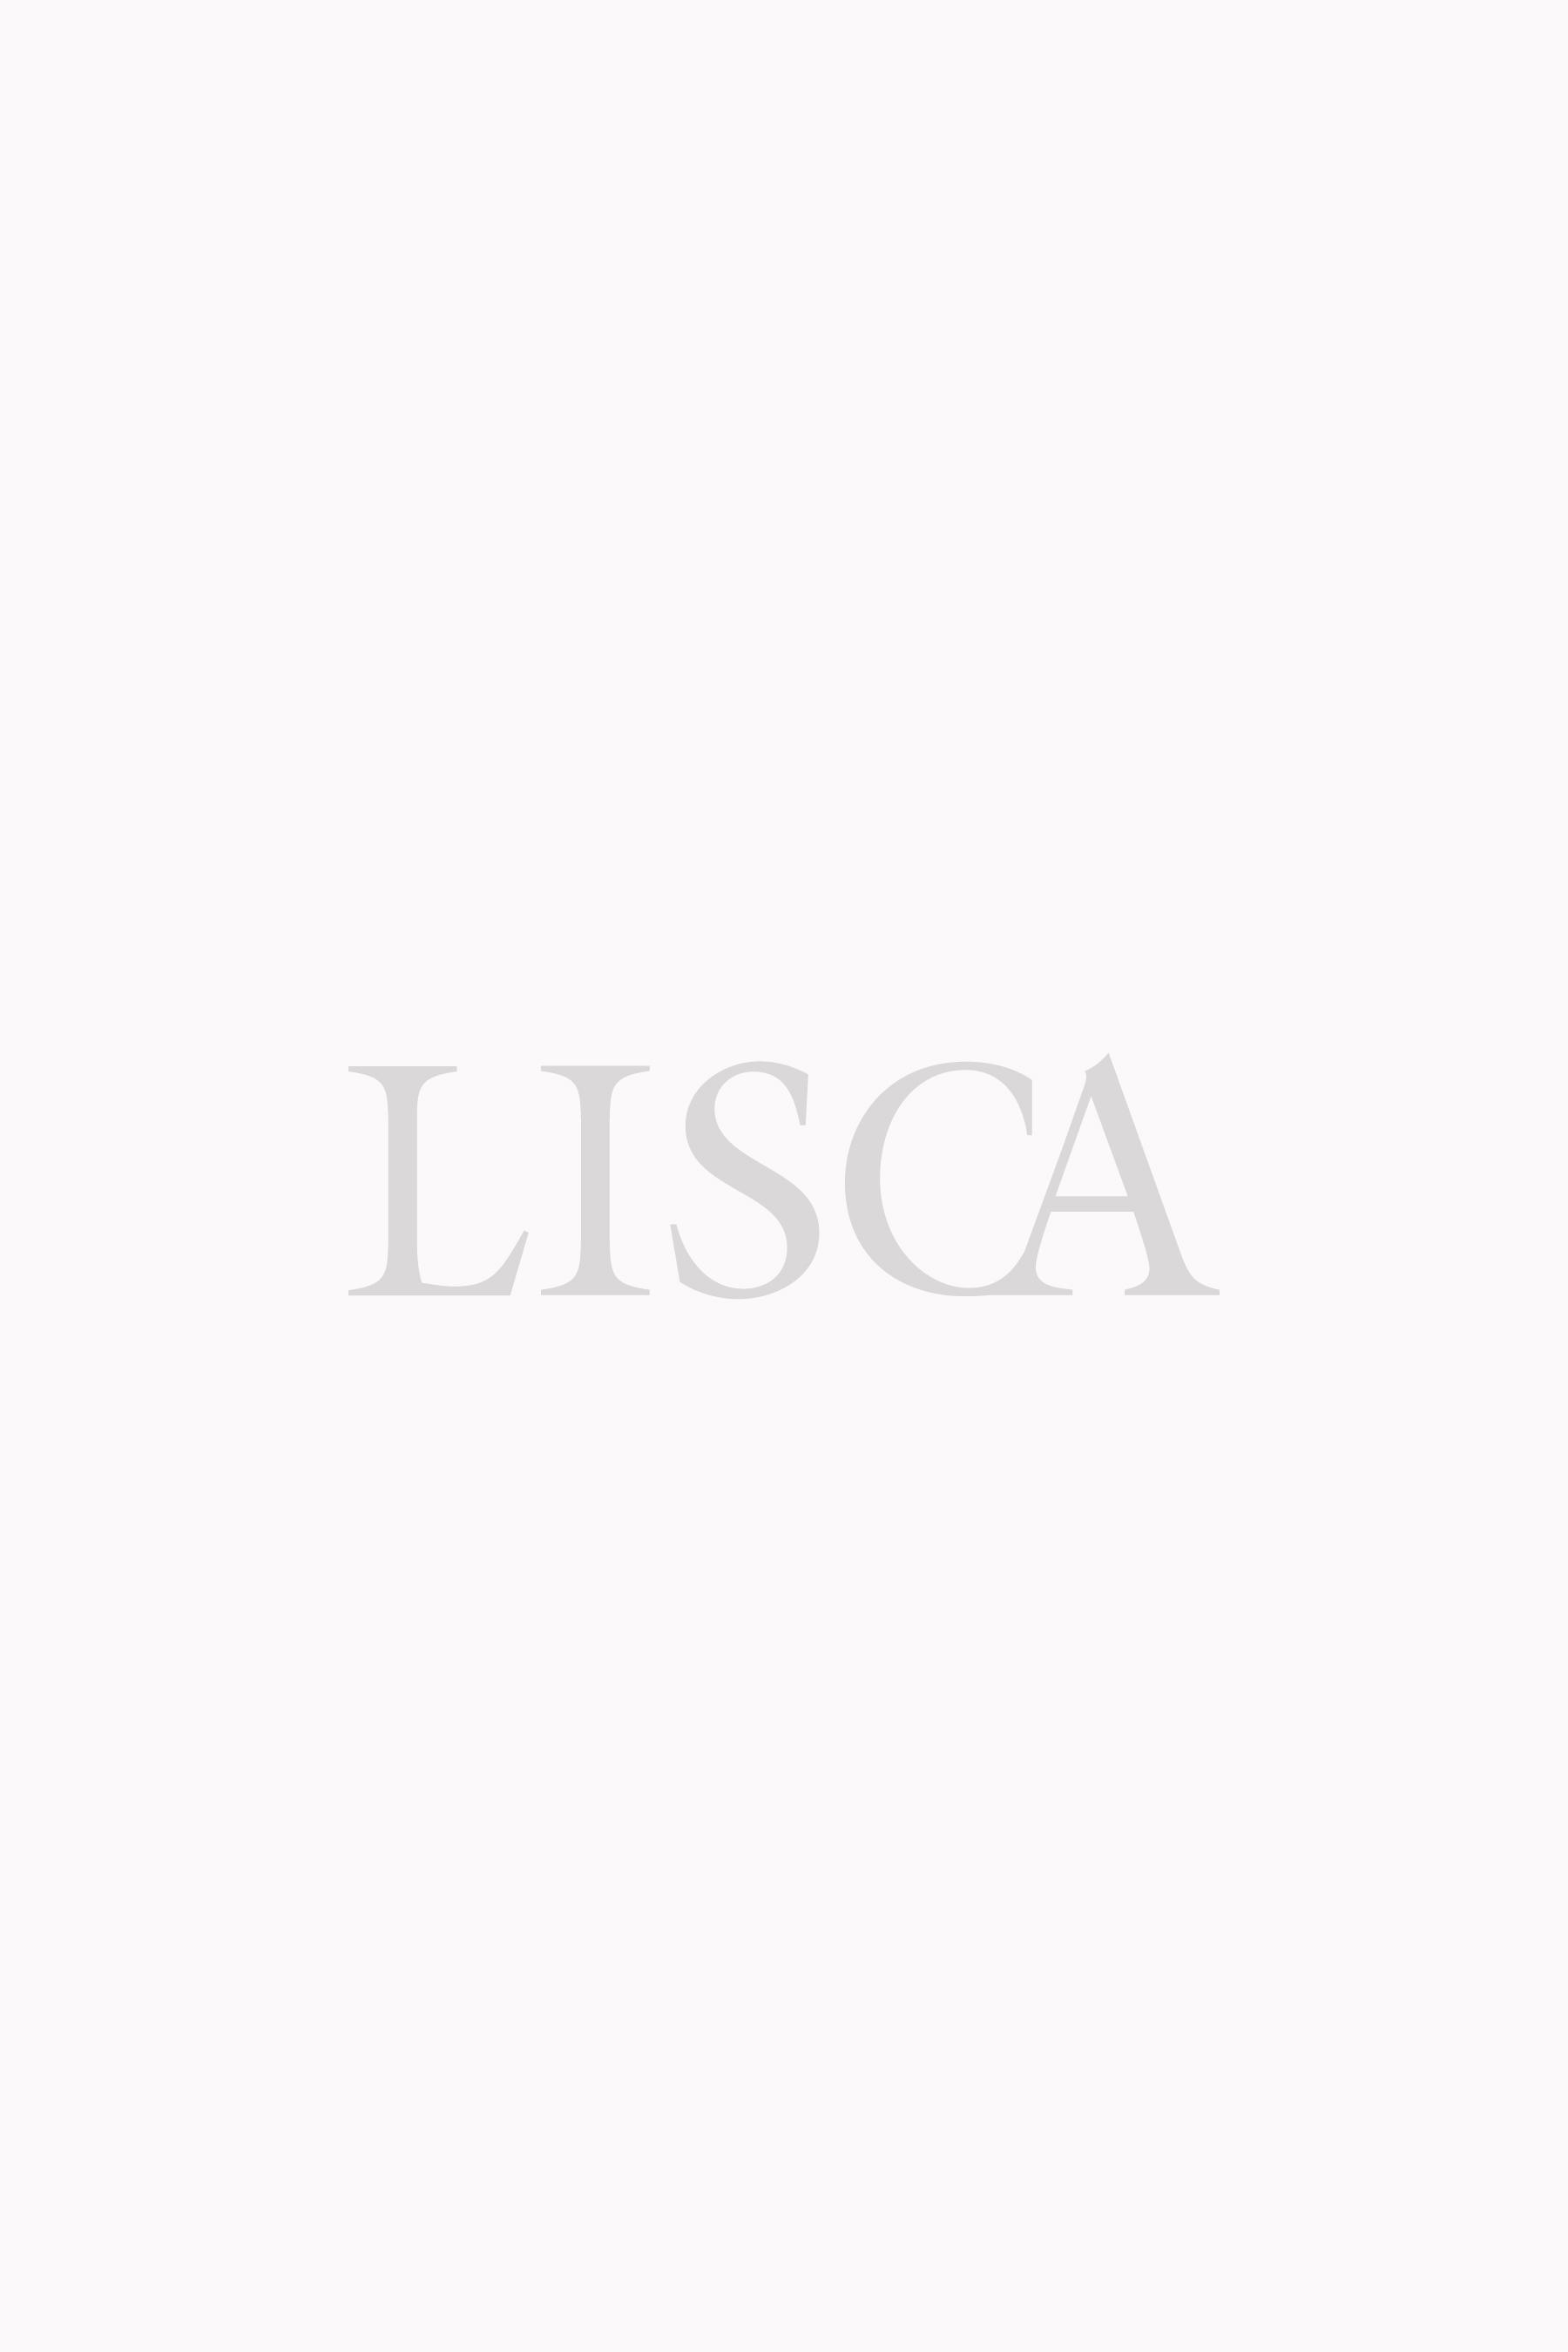 "Триаголен push-up градник без жица ""Navarre Beach"" - костим за капење"